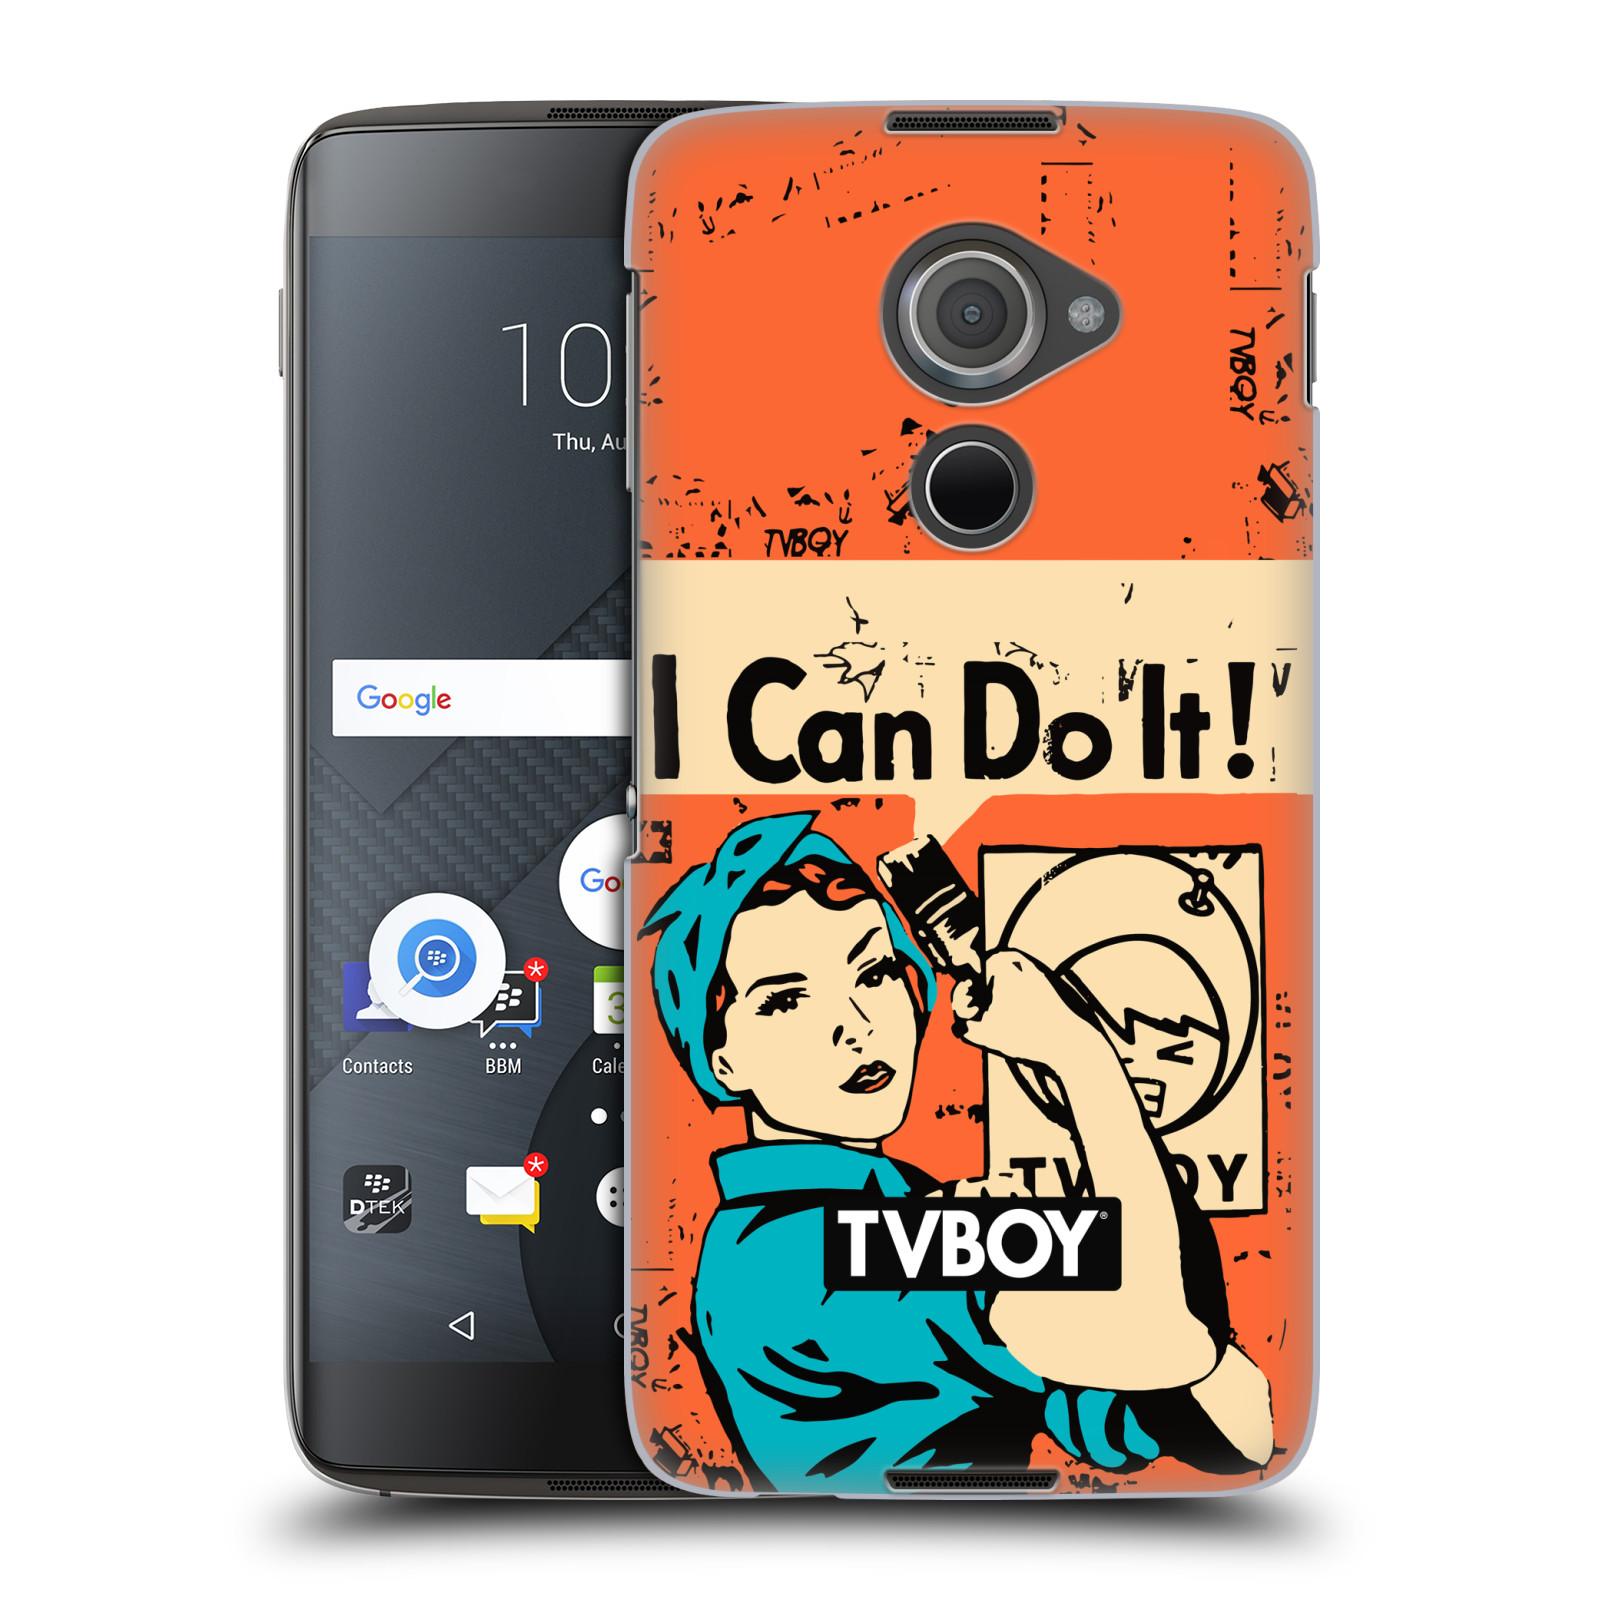 Plastové pouzdro na mobil Blackberry DTEK60 (Argon) - Head Case - TVBOY - I can do it